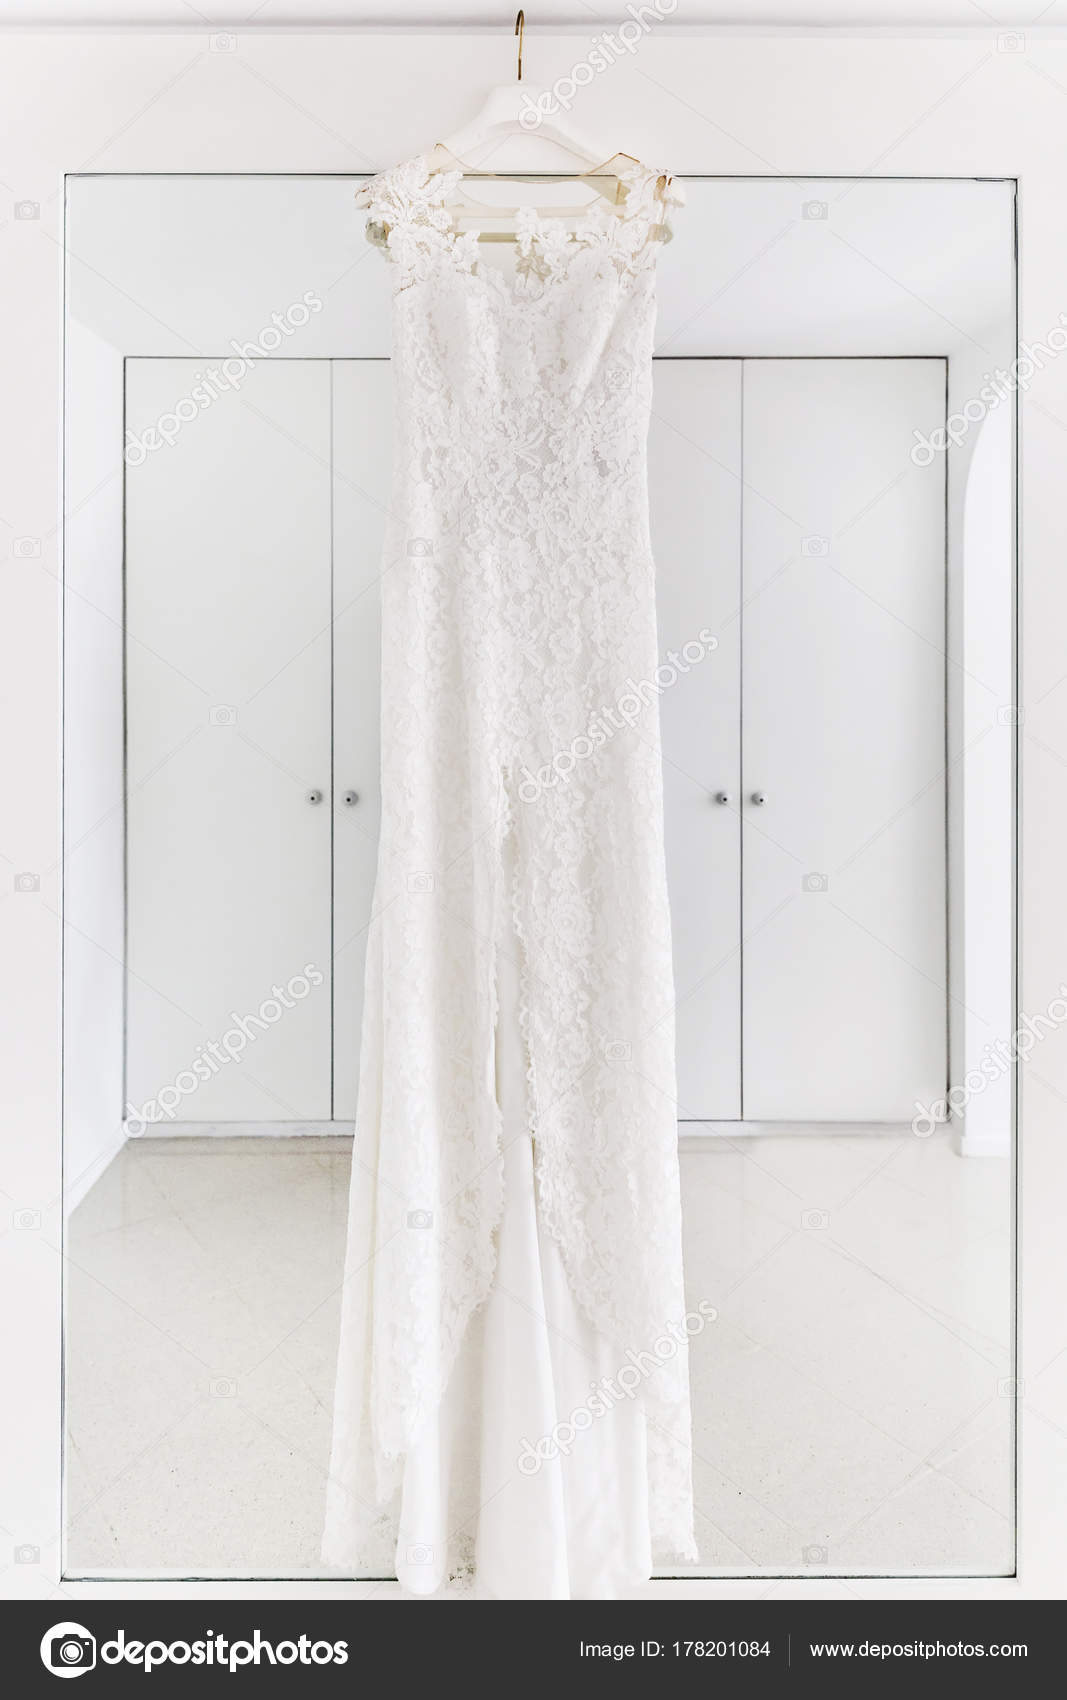 Vestido de novia colgado en la sala blanca — Foto de stock © A ...